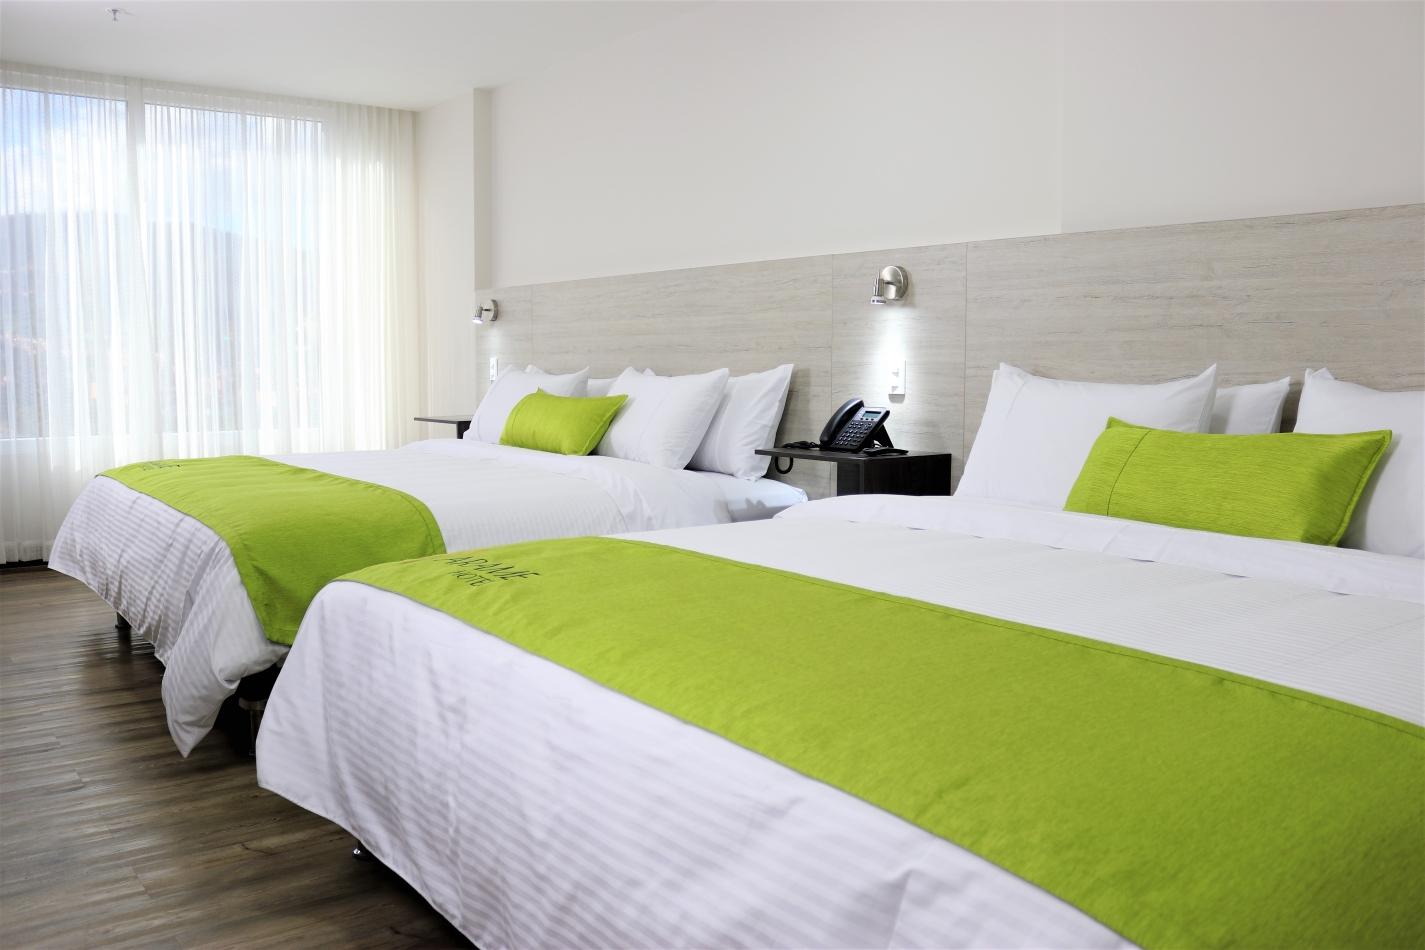 IM 9 Galeria Hotel Arame